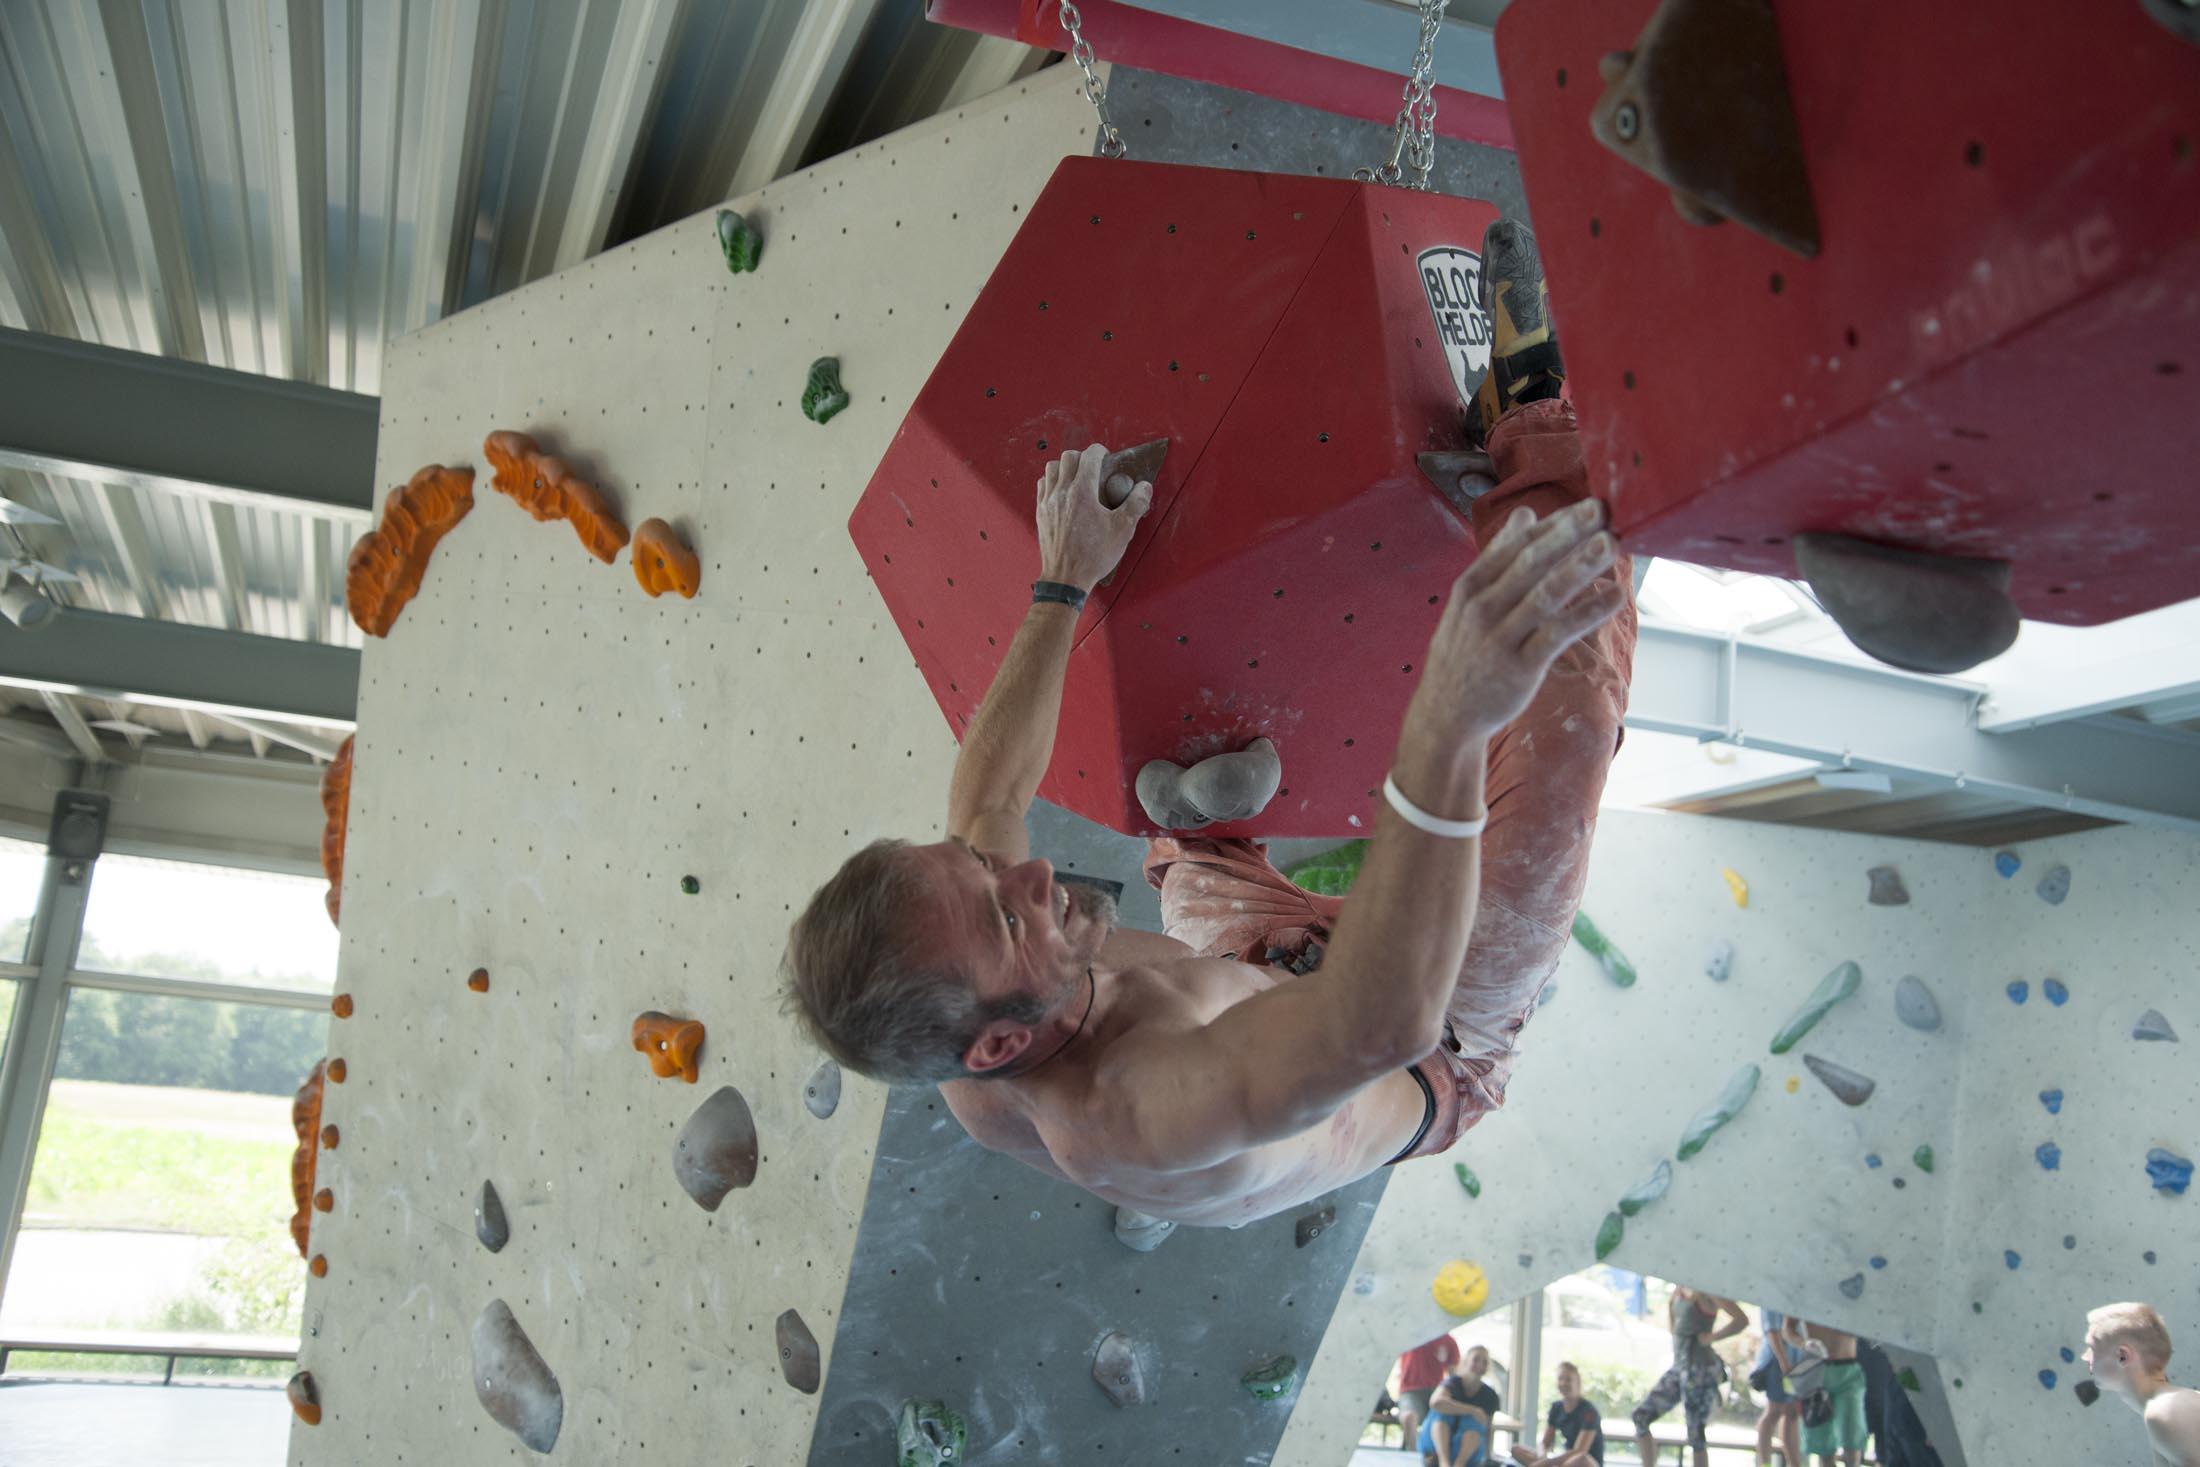 Quali, internationaler bouldercup Frankenjura 2016, BLOCKHELDEN Erlangen, Mammut, Bergfreunde.de, Boulderwettkampf07092016225